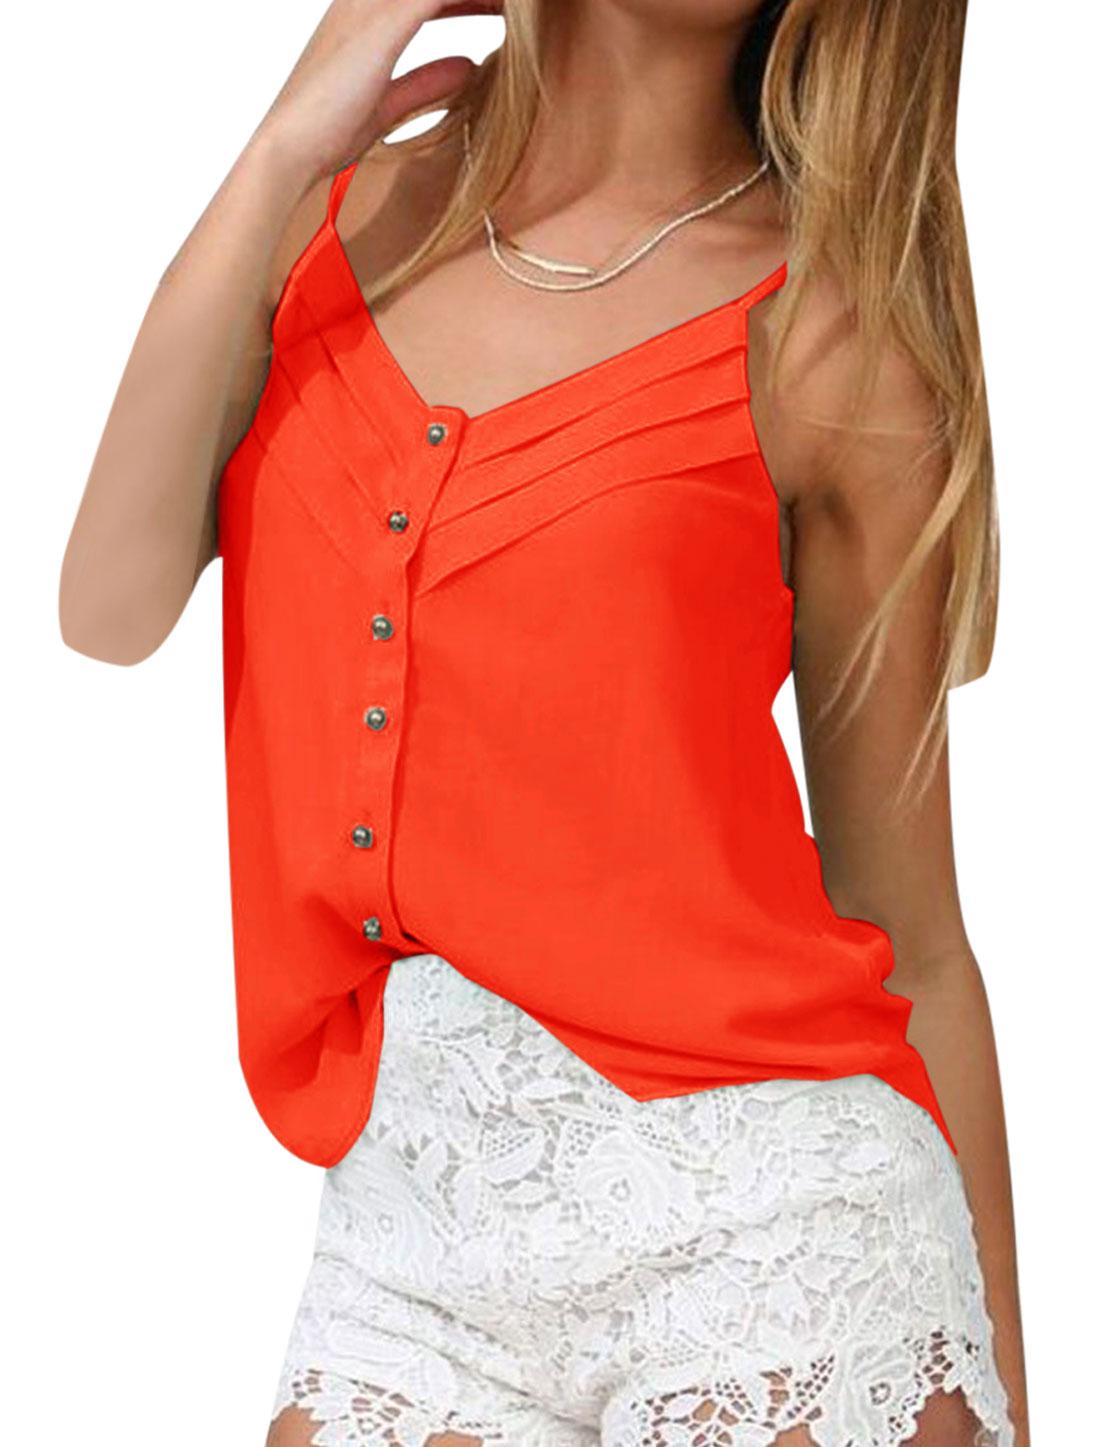 Lady V Neck Spaghetti Strap Single Breasted Sexy Cami Top Orange Red XS